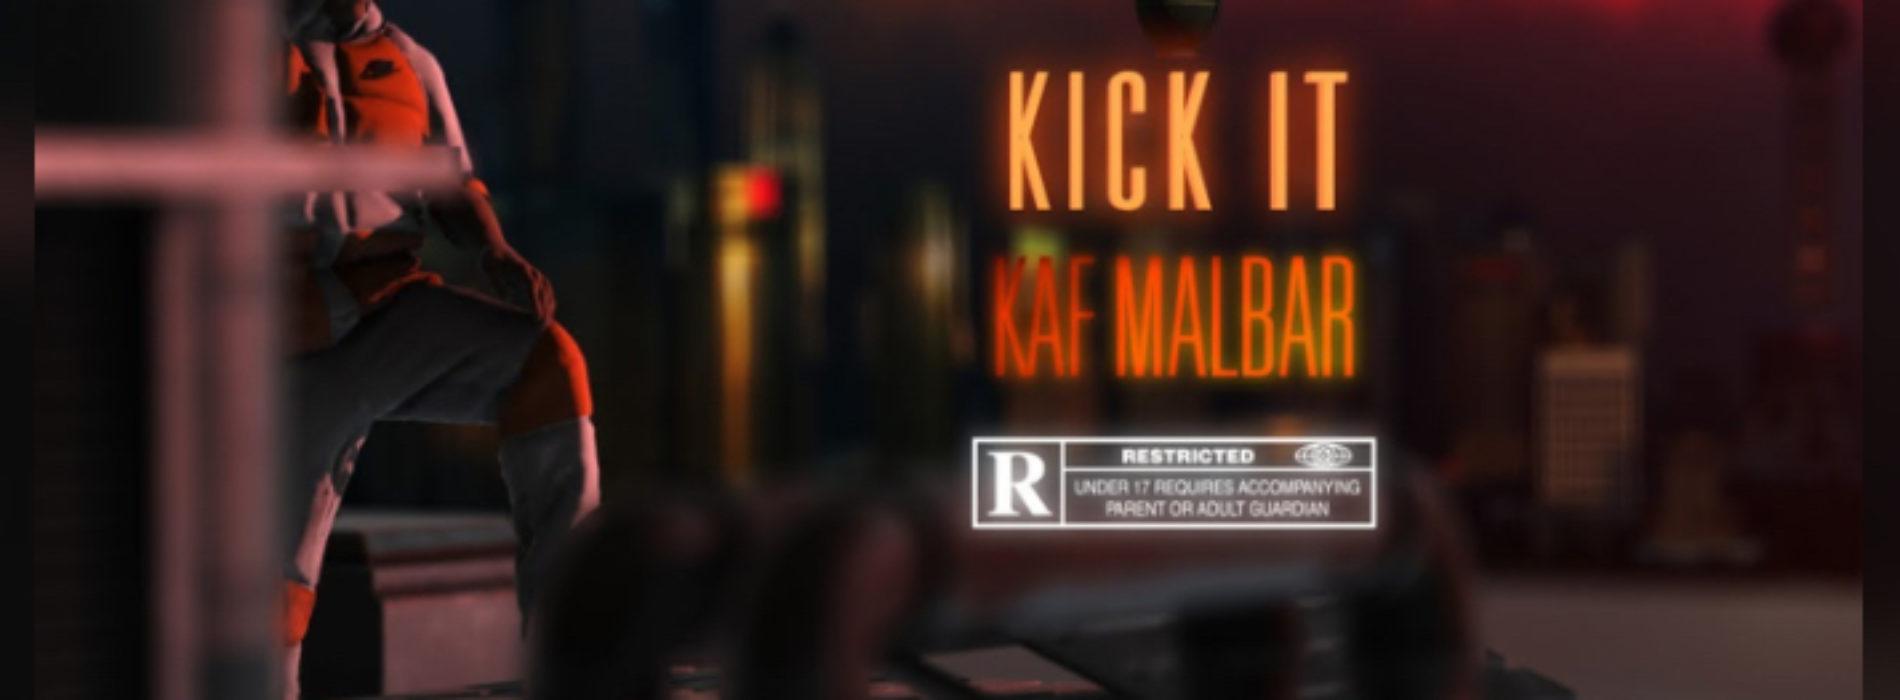 KAF MALBAR feat RIKOS – Kick It – Clip – Décembre 2020